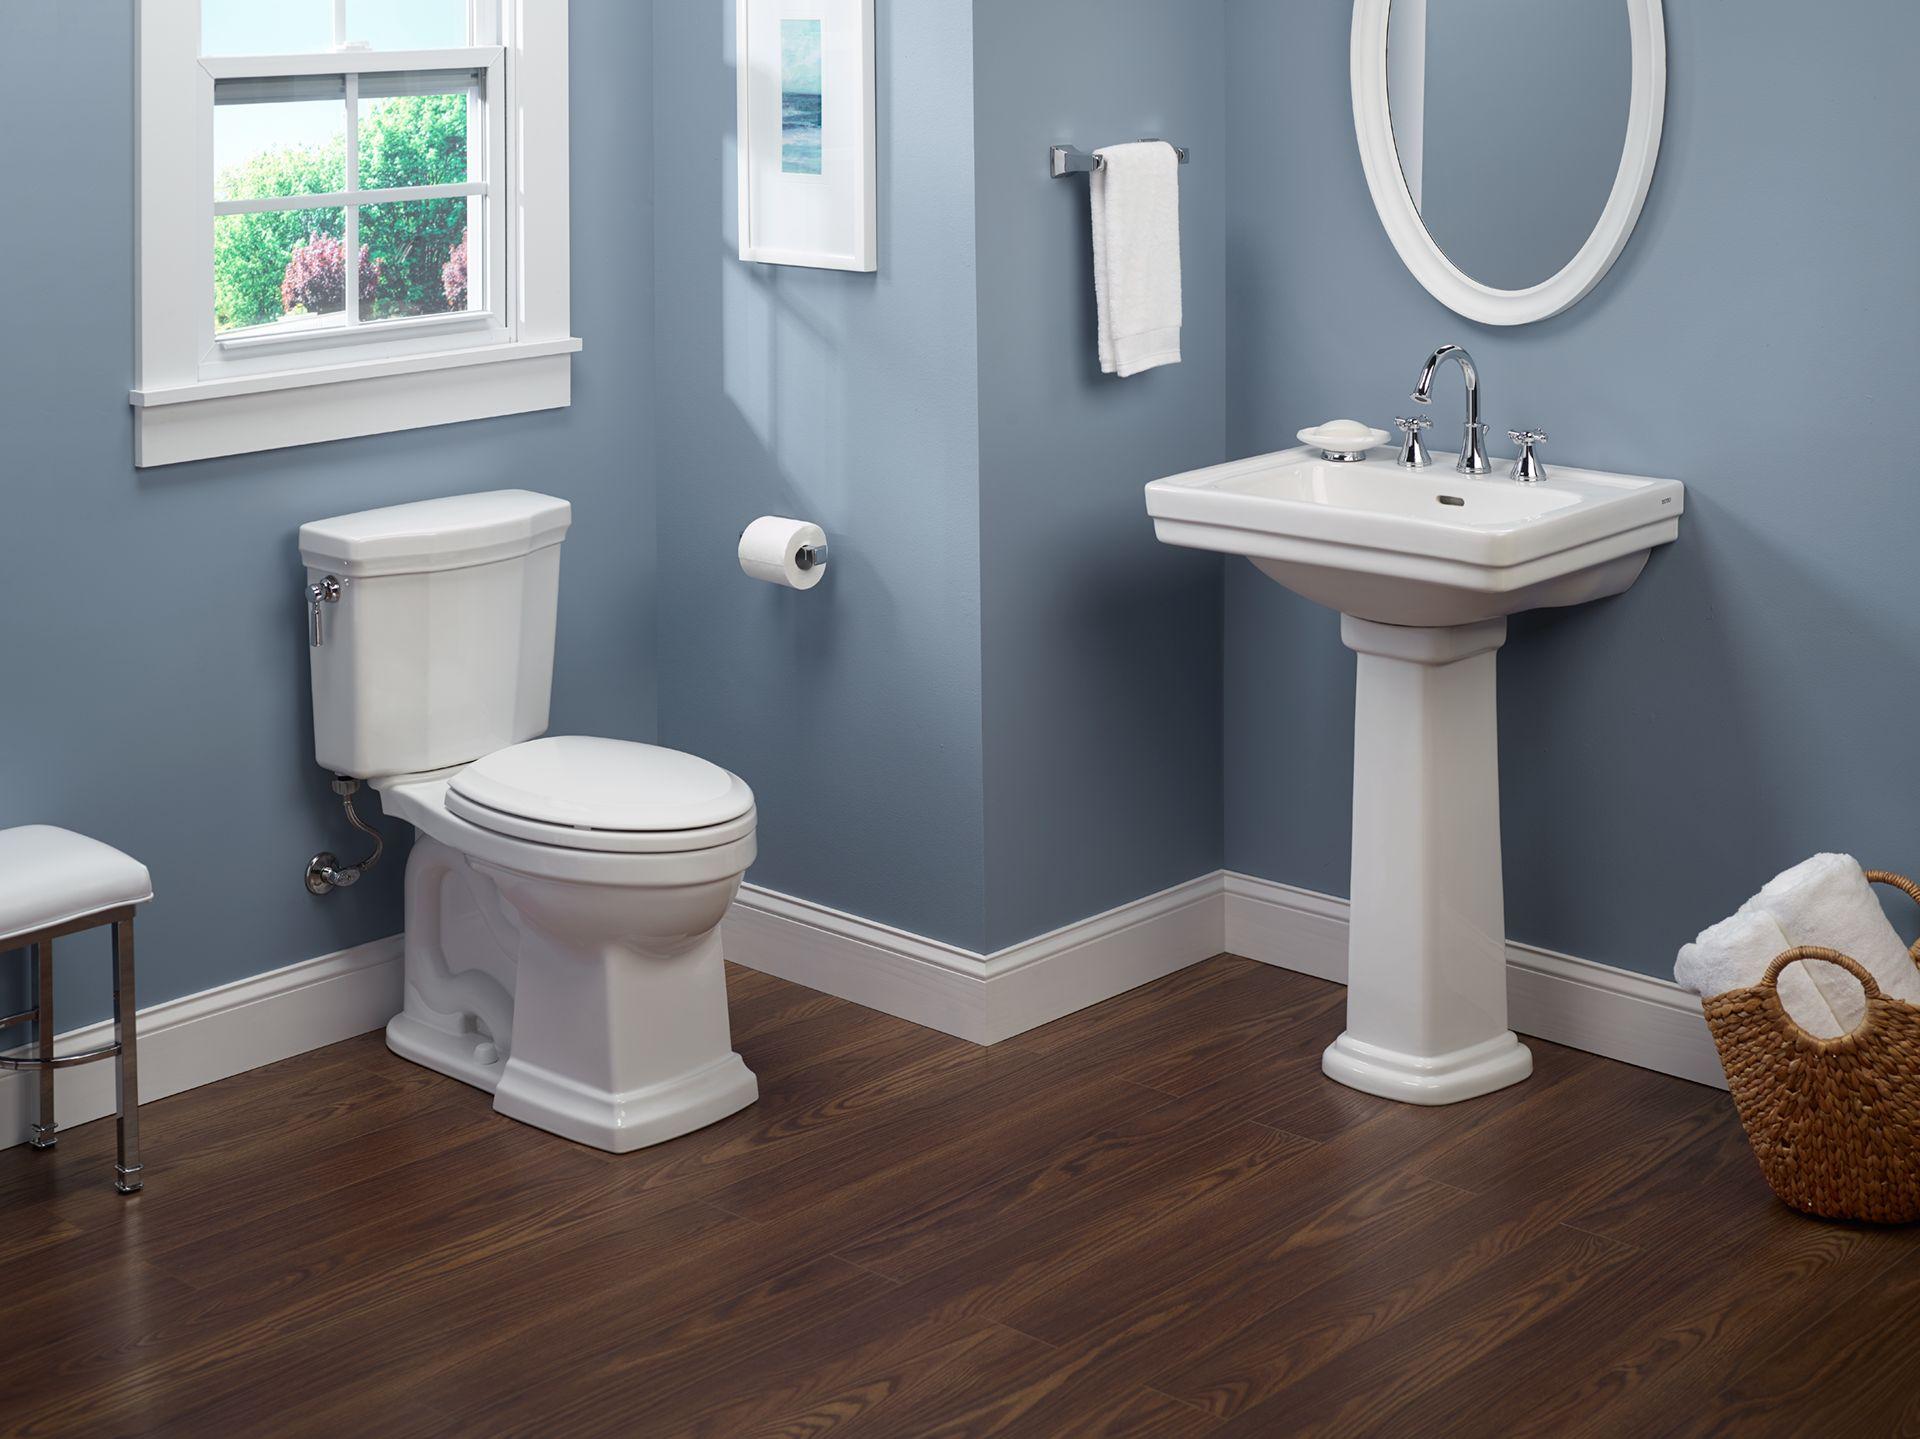 Promenade Ii Two Piece Toilet 1 28 Gpf Totousa Com